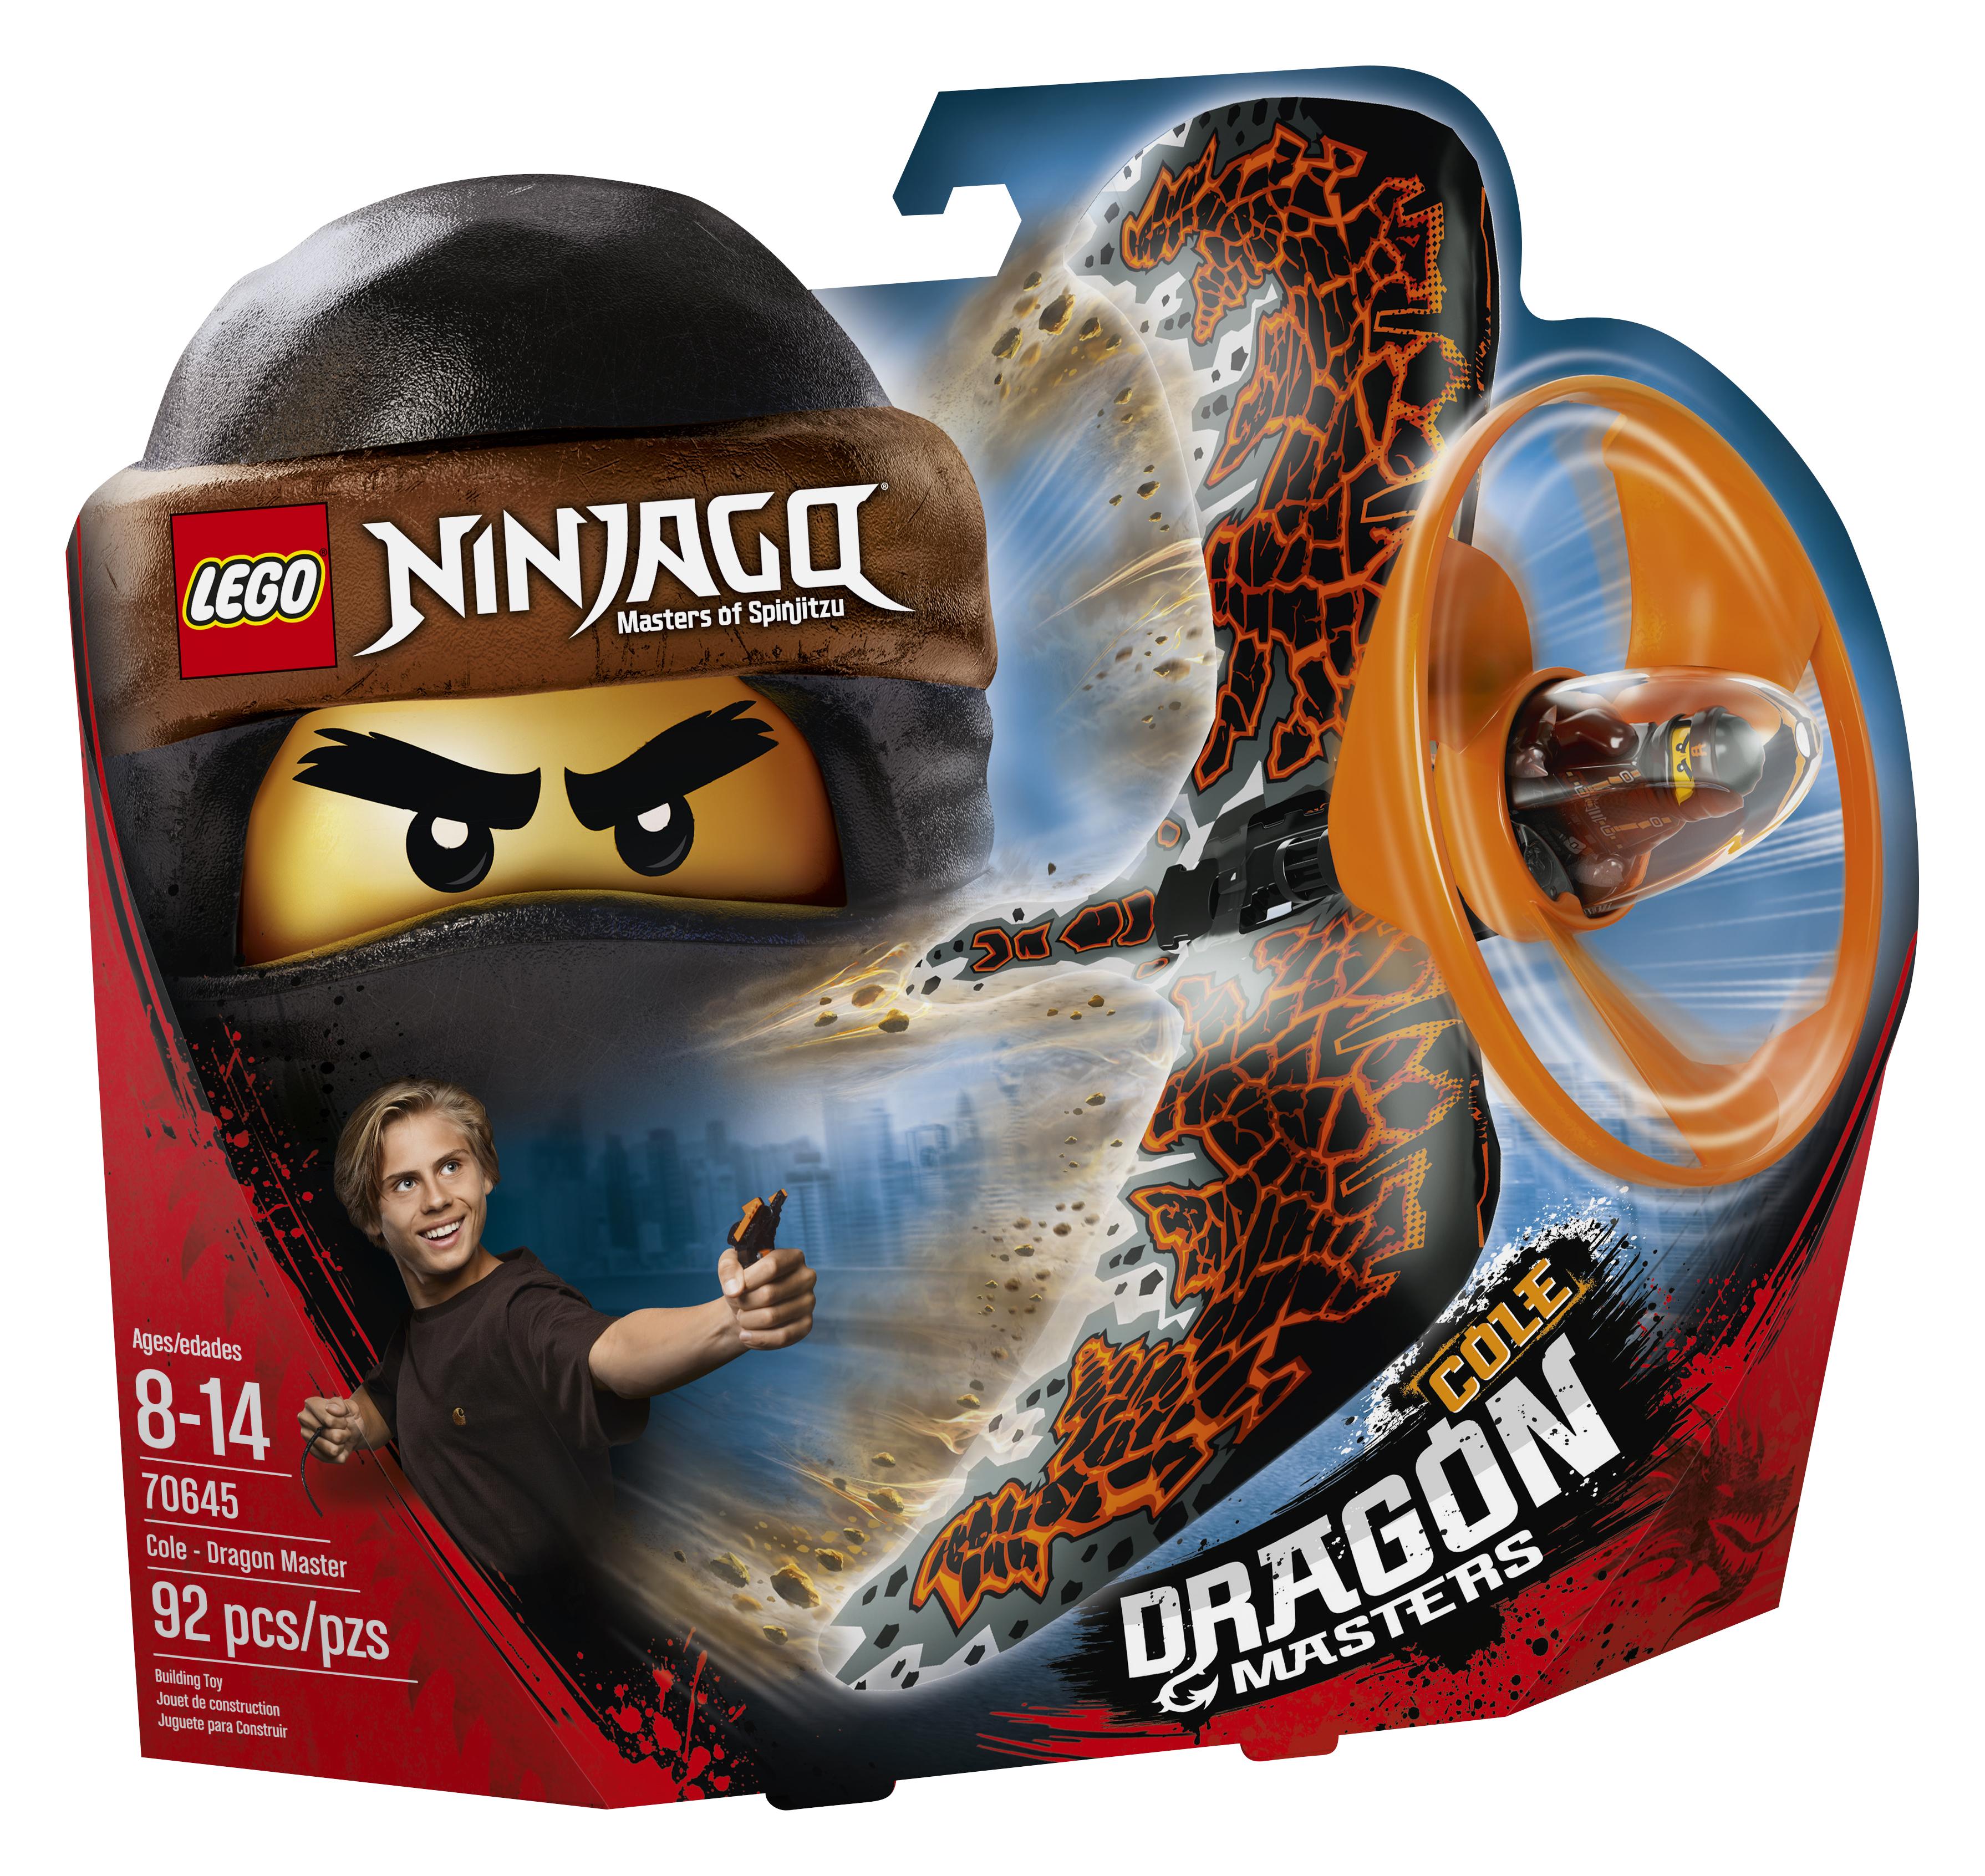 LEGO LEGO Конструктор LEGO Ninjago 70645 Коул-Мастер дракона